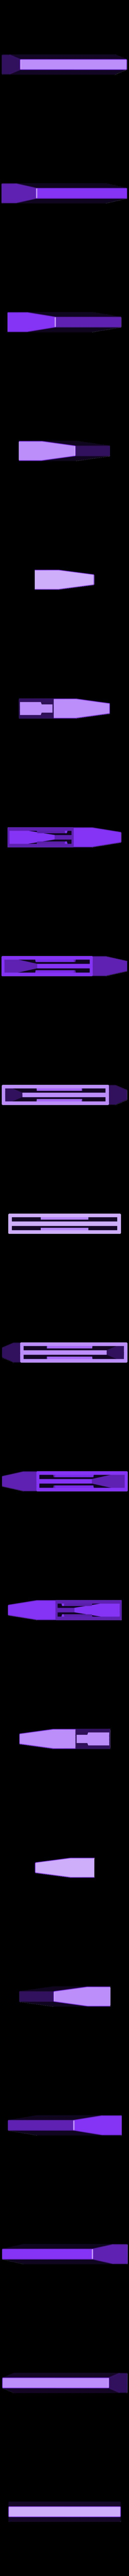 scraper_low_cap.STL Download free STL file Scraper With Cap • 3D printing template, alexberkowitz